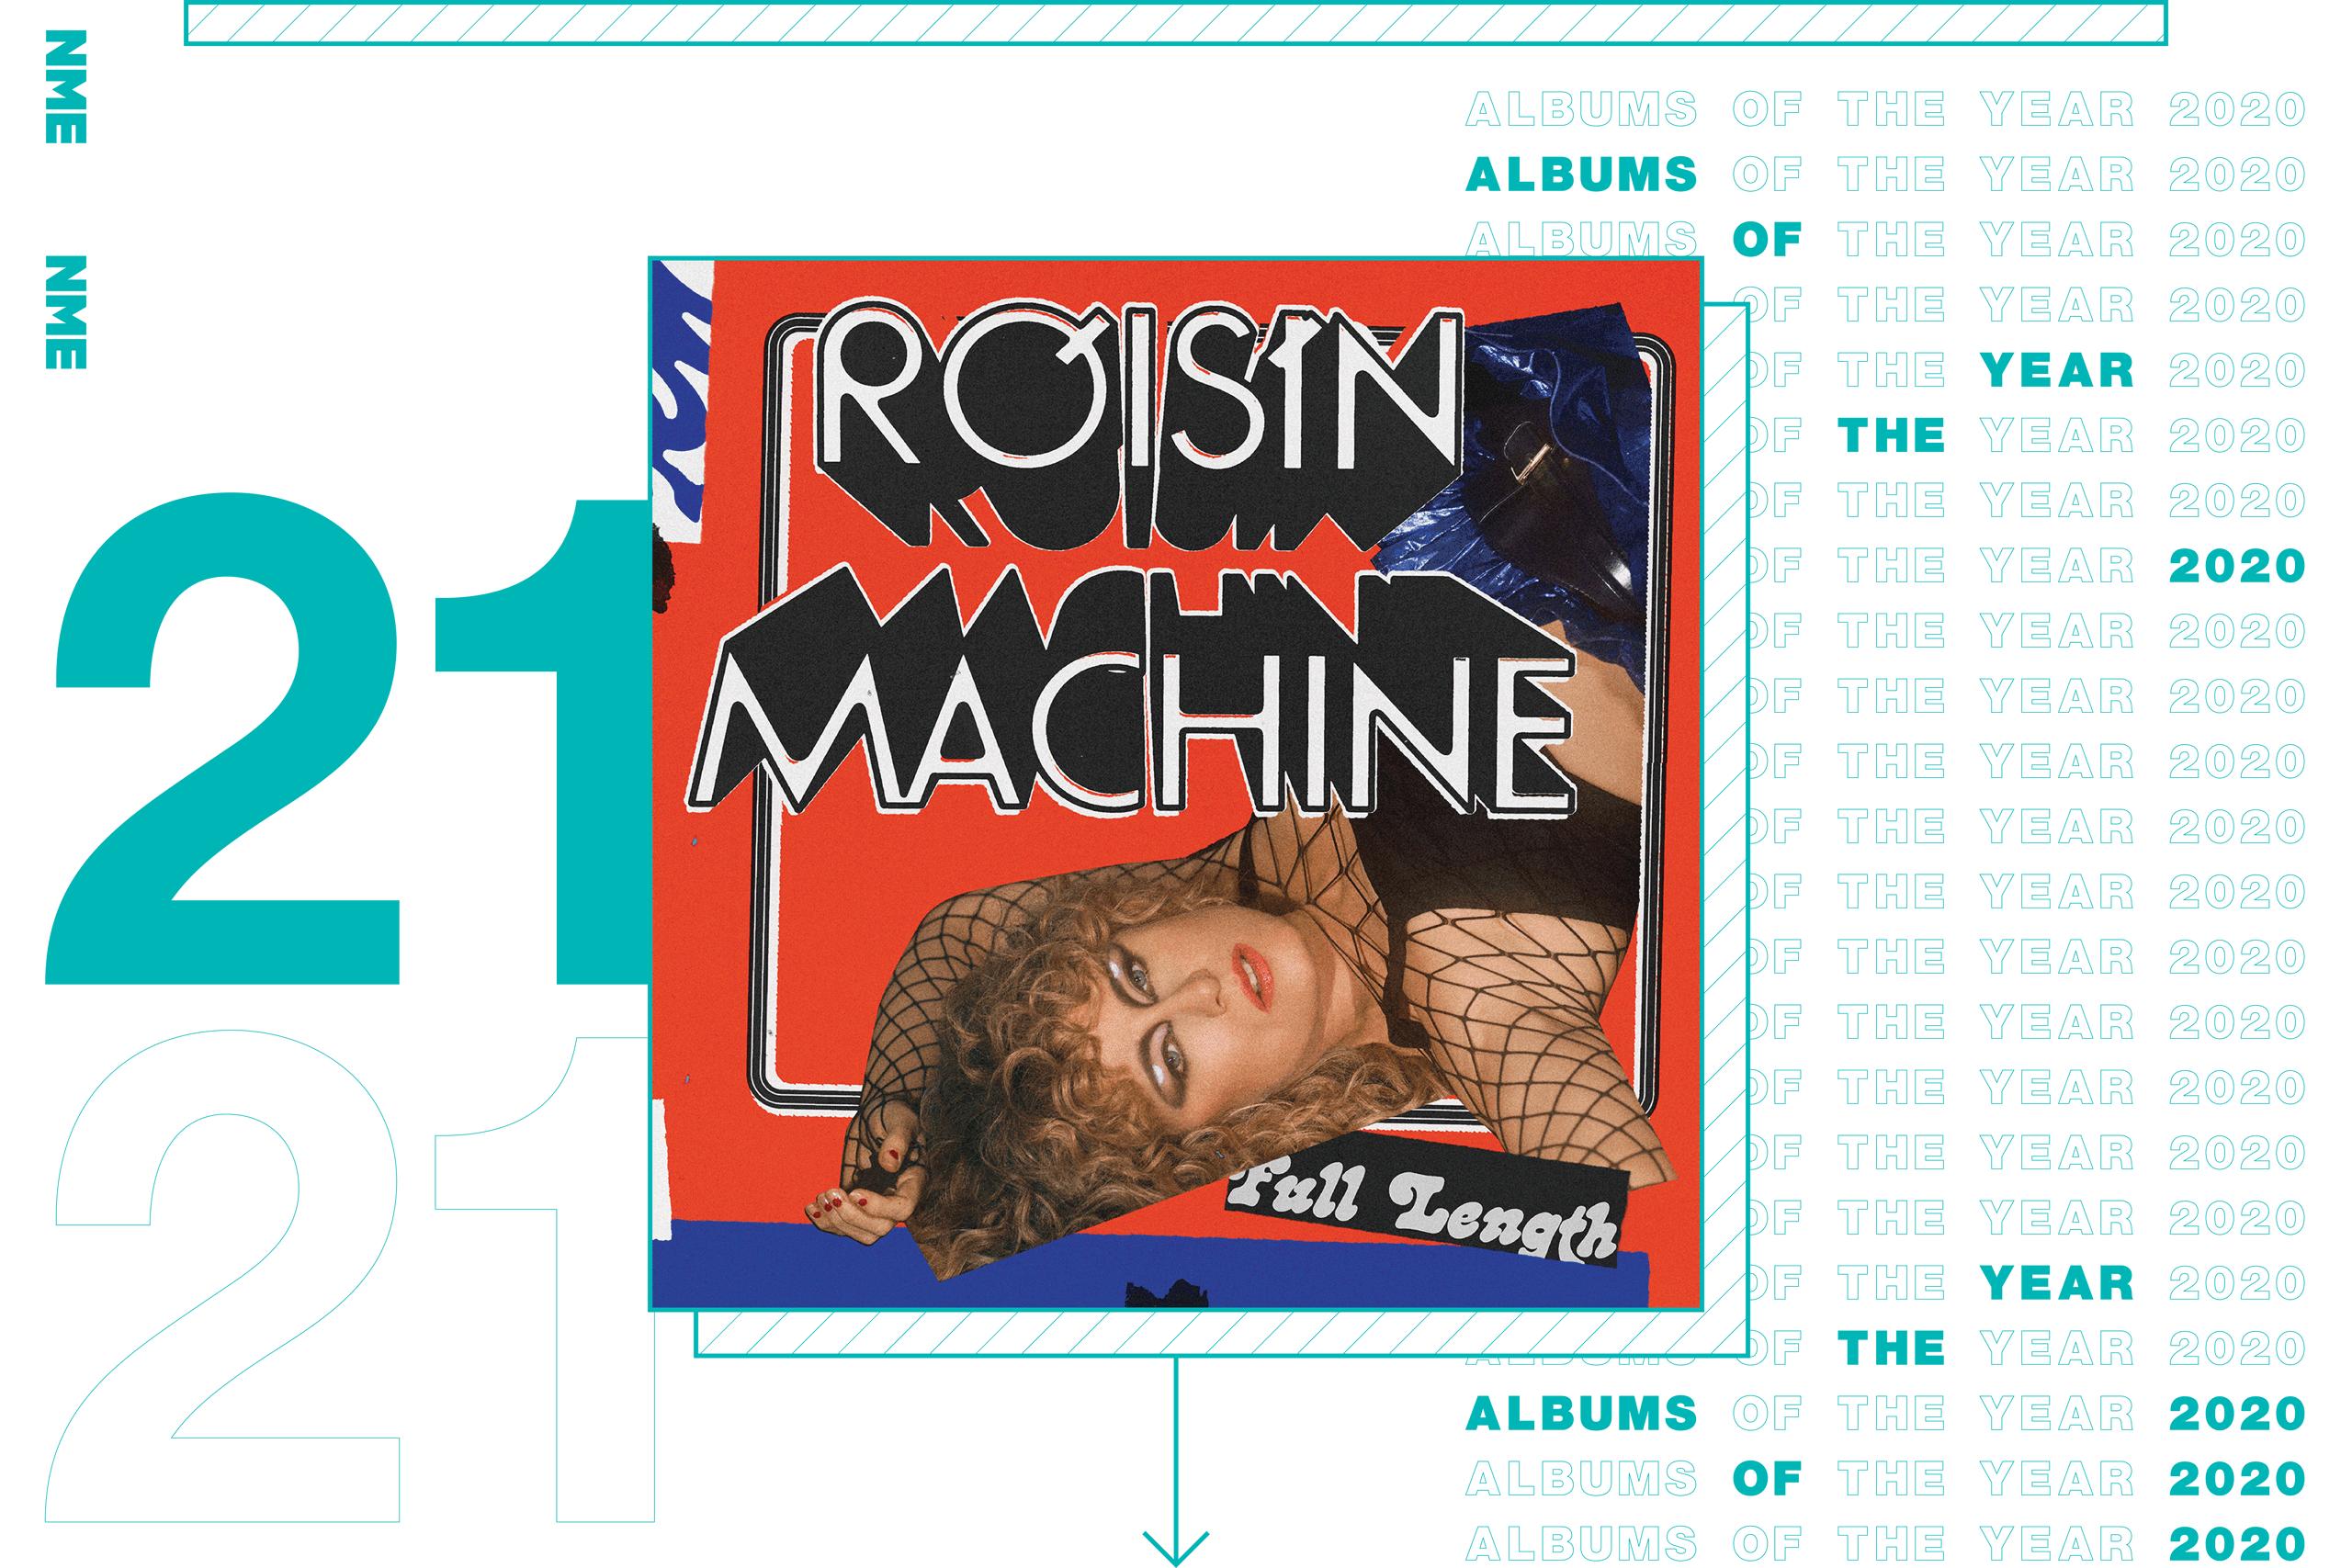 NME Album Of The Year 2020 Roisin Murphy, 'Roisin Machine'